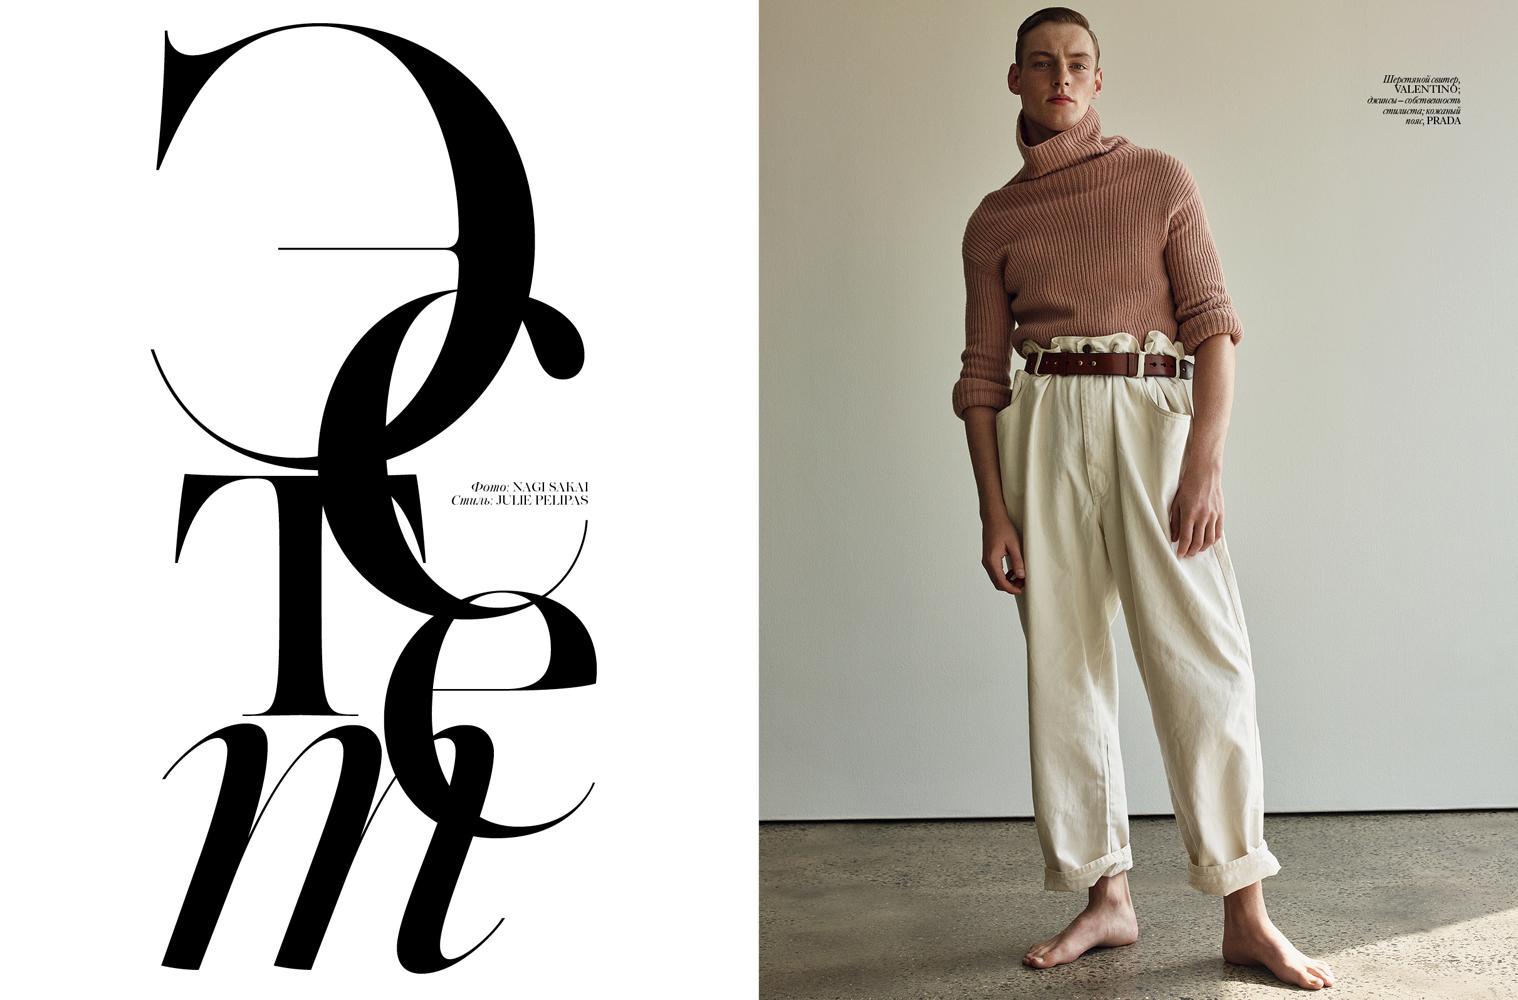 Vogue_Man story copy.jpg